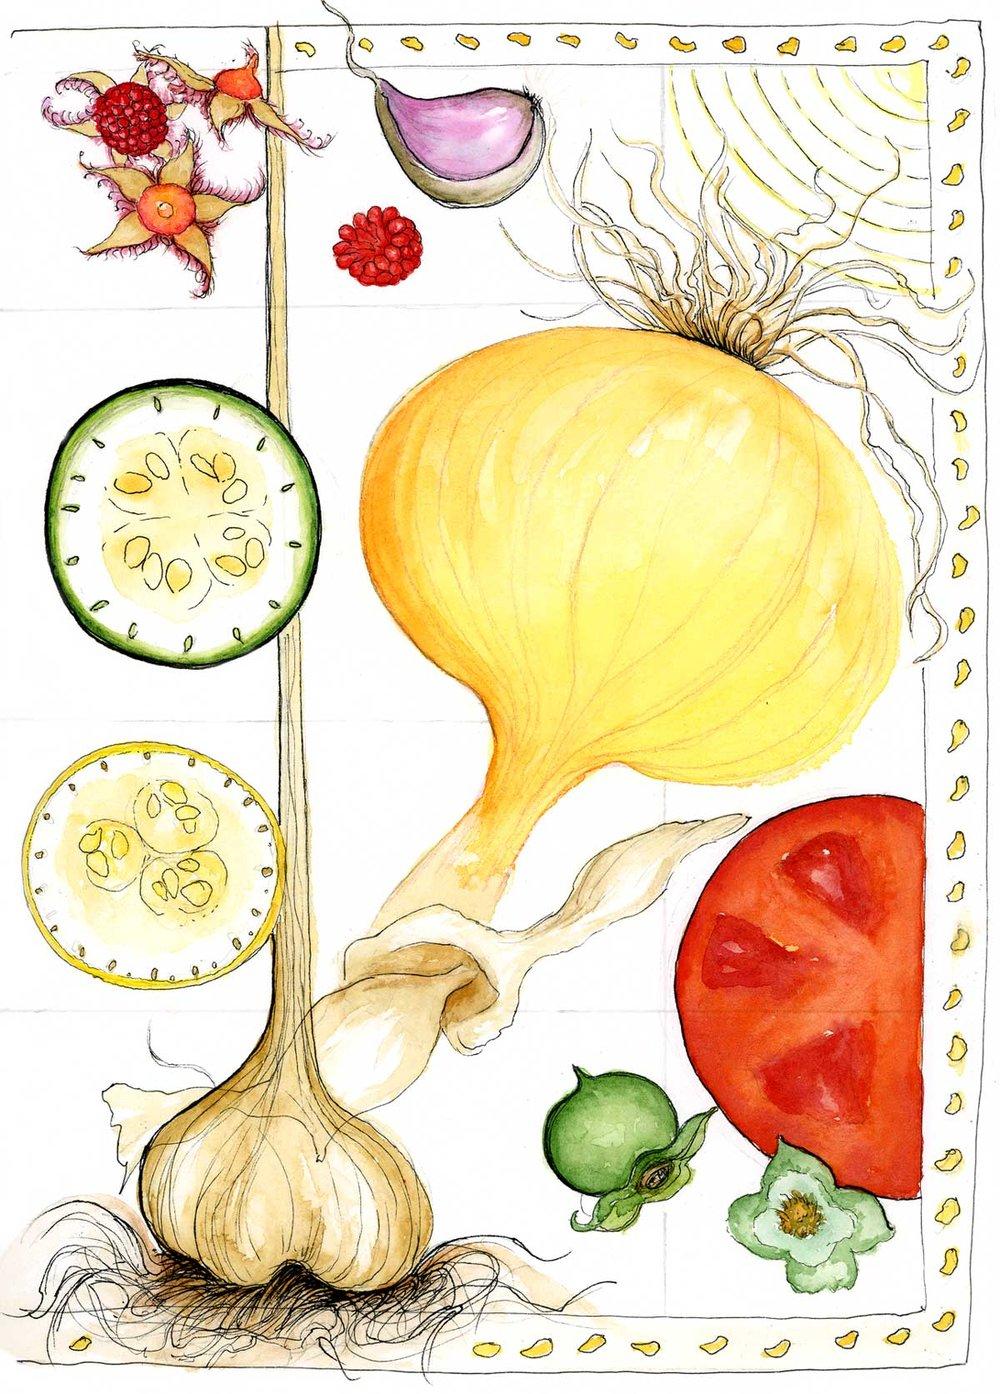 Onion Berries